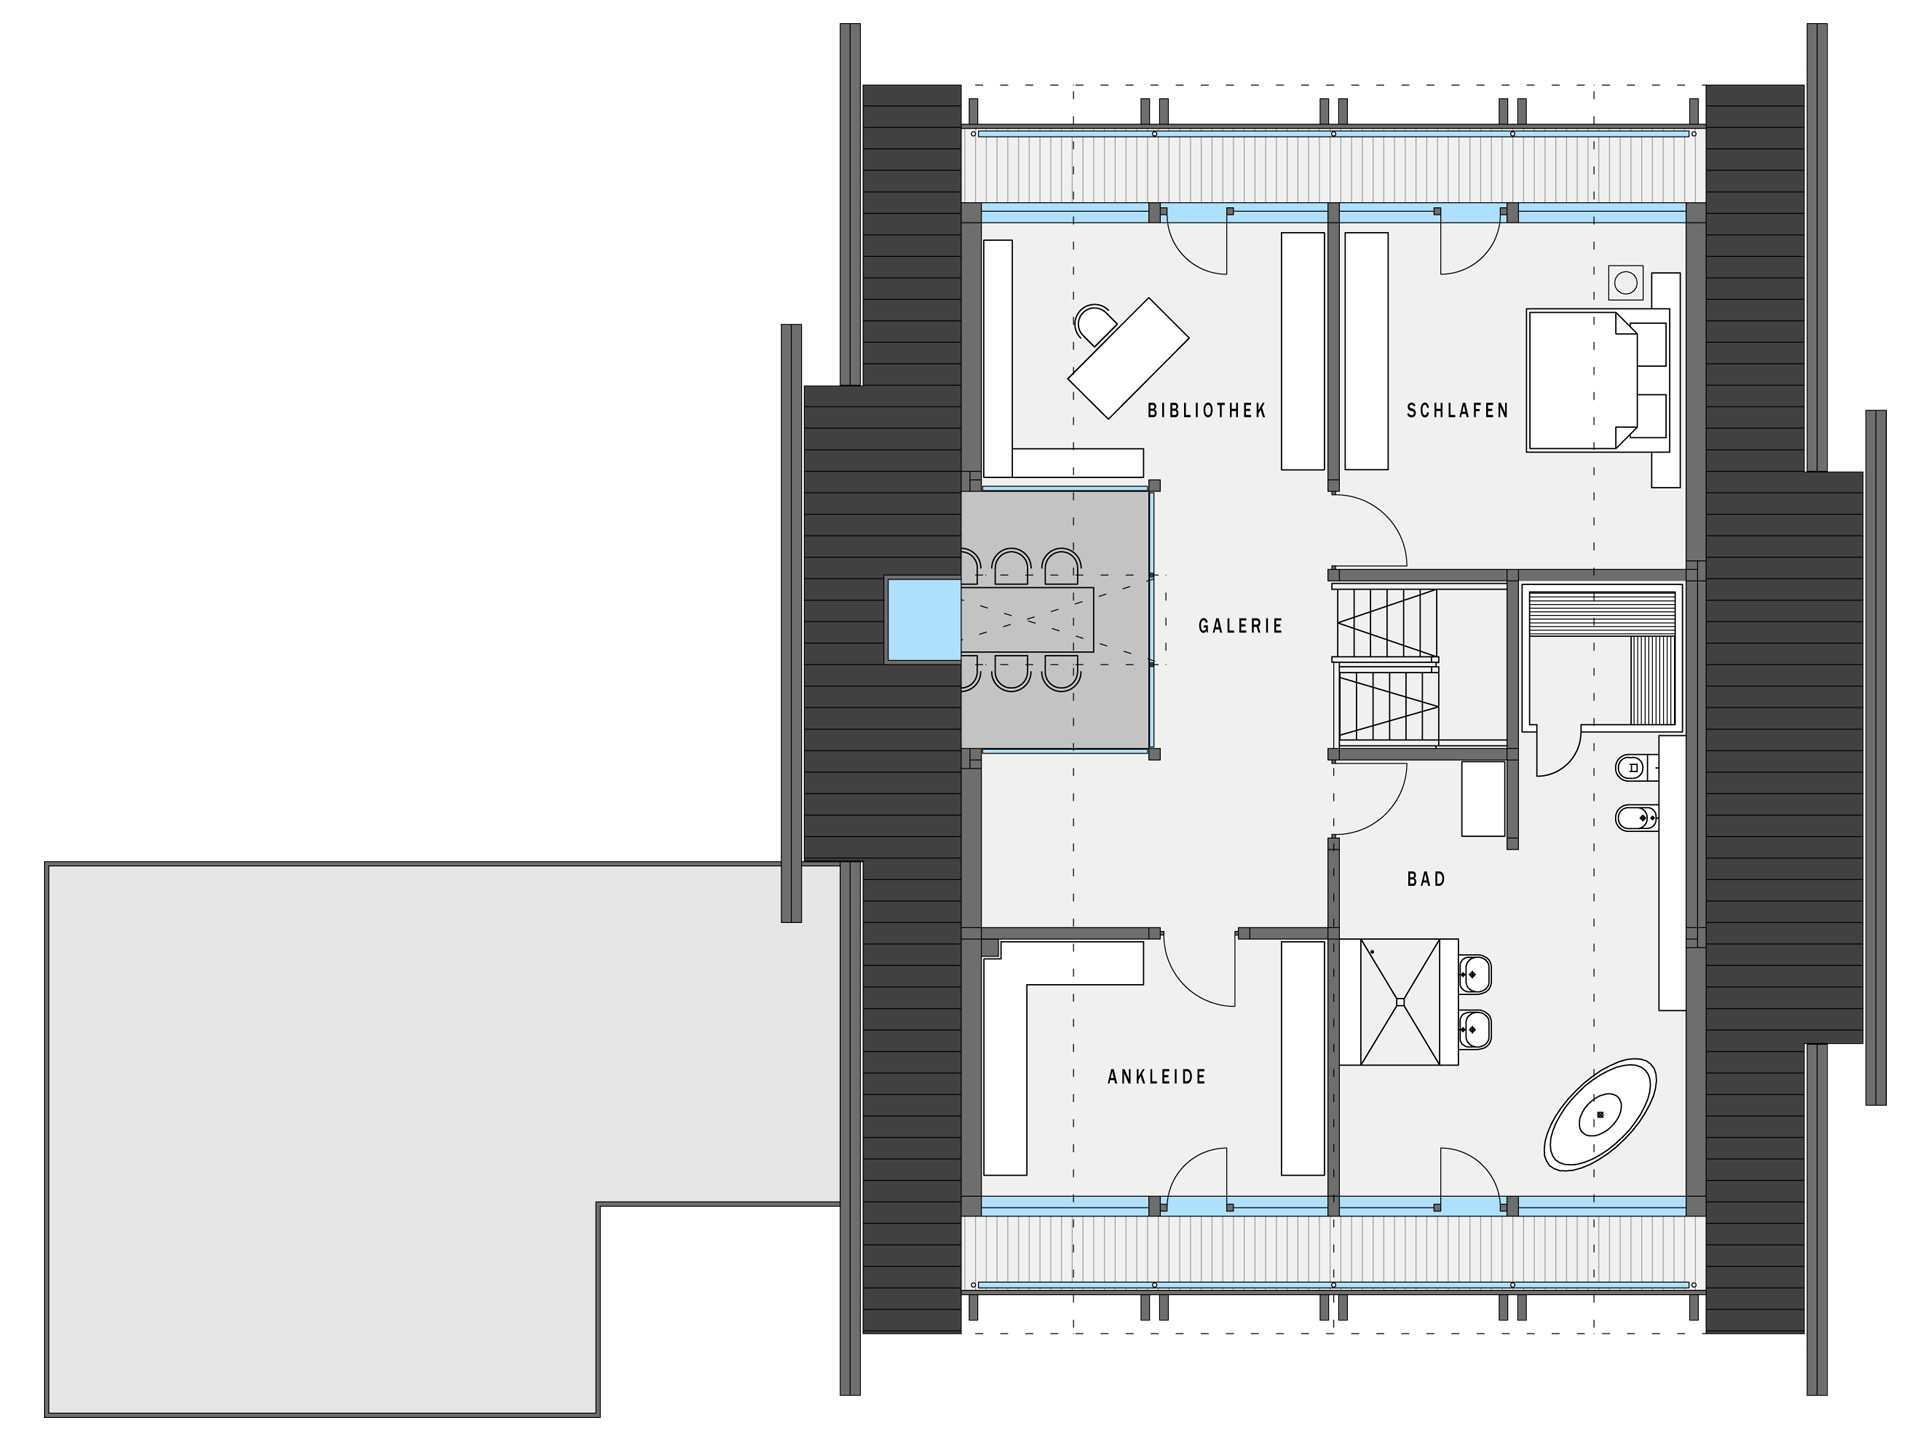 huf haus art 4 projektbeispiel 2 huf haus. Black Bedroom Furniture Sets. Home Design Ideas